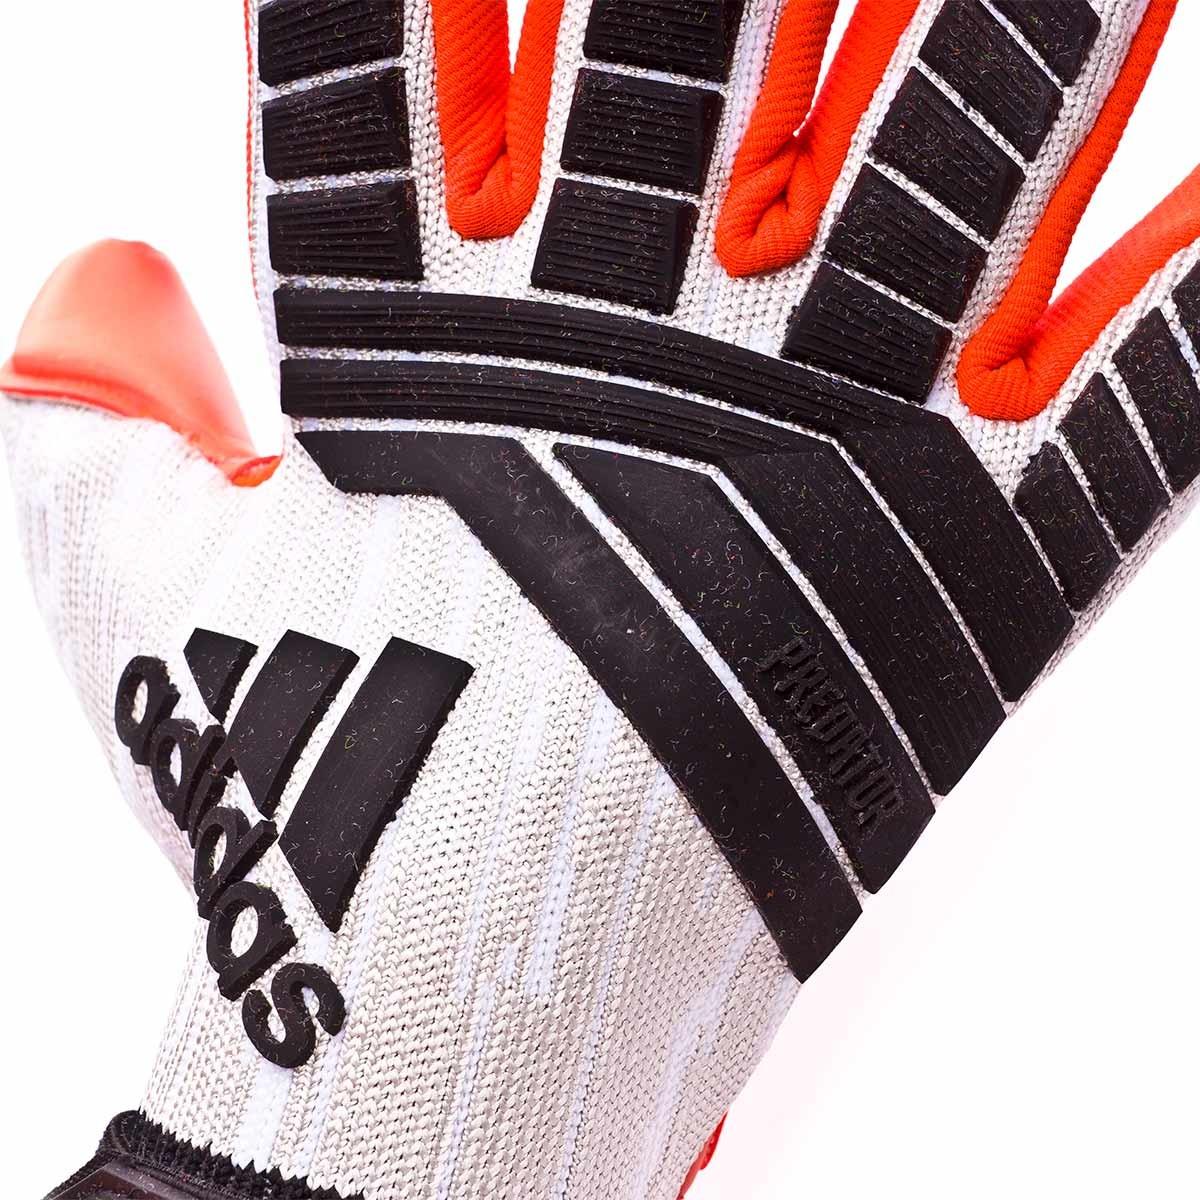 0f92eab27b43 ... Guante Predator Pro Manuel Neuer White-Black-Solar red. CATEGORY.  Goalkeeper Gloves